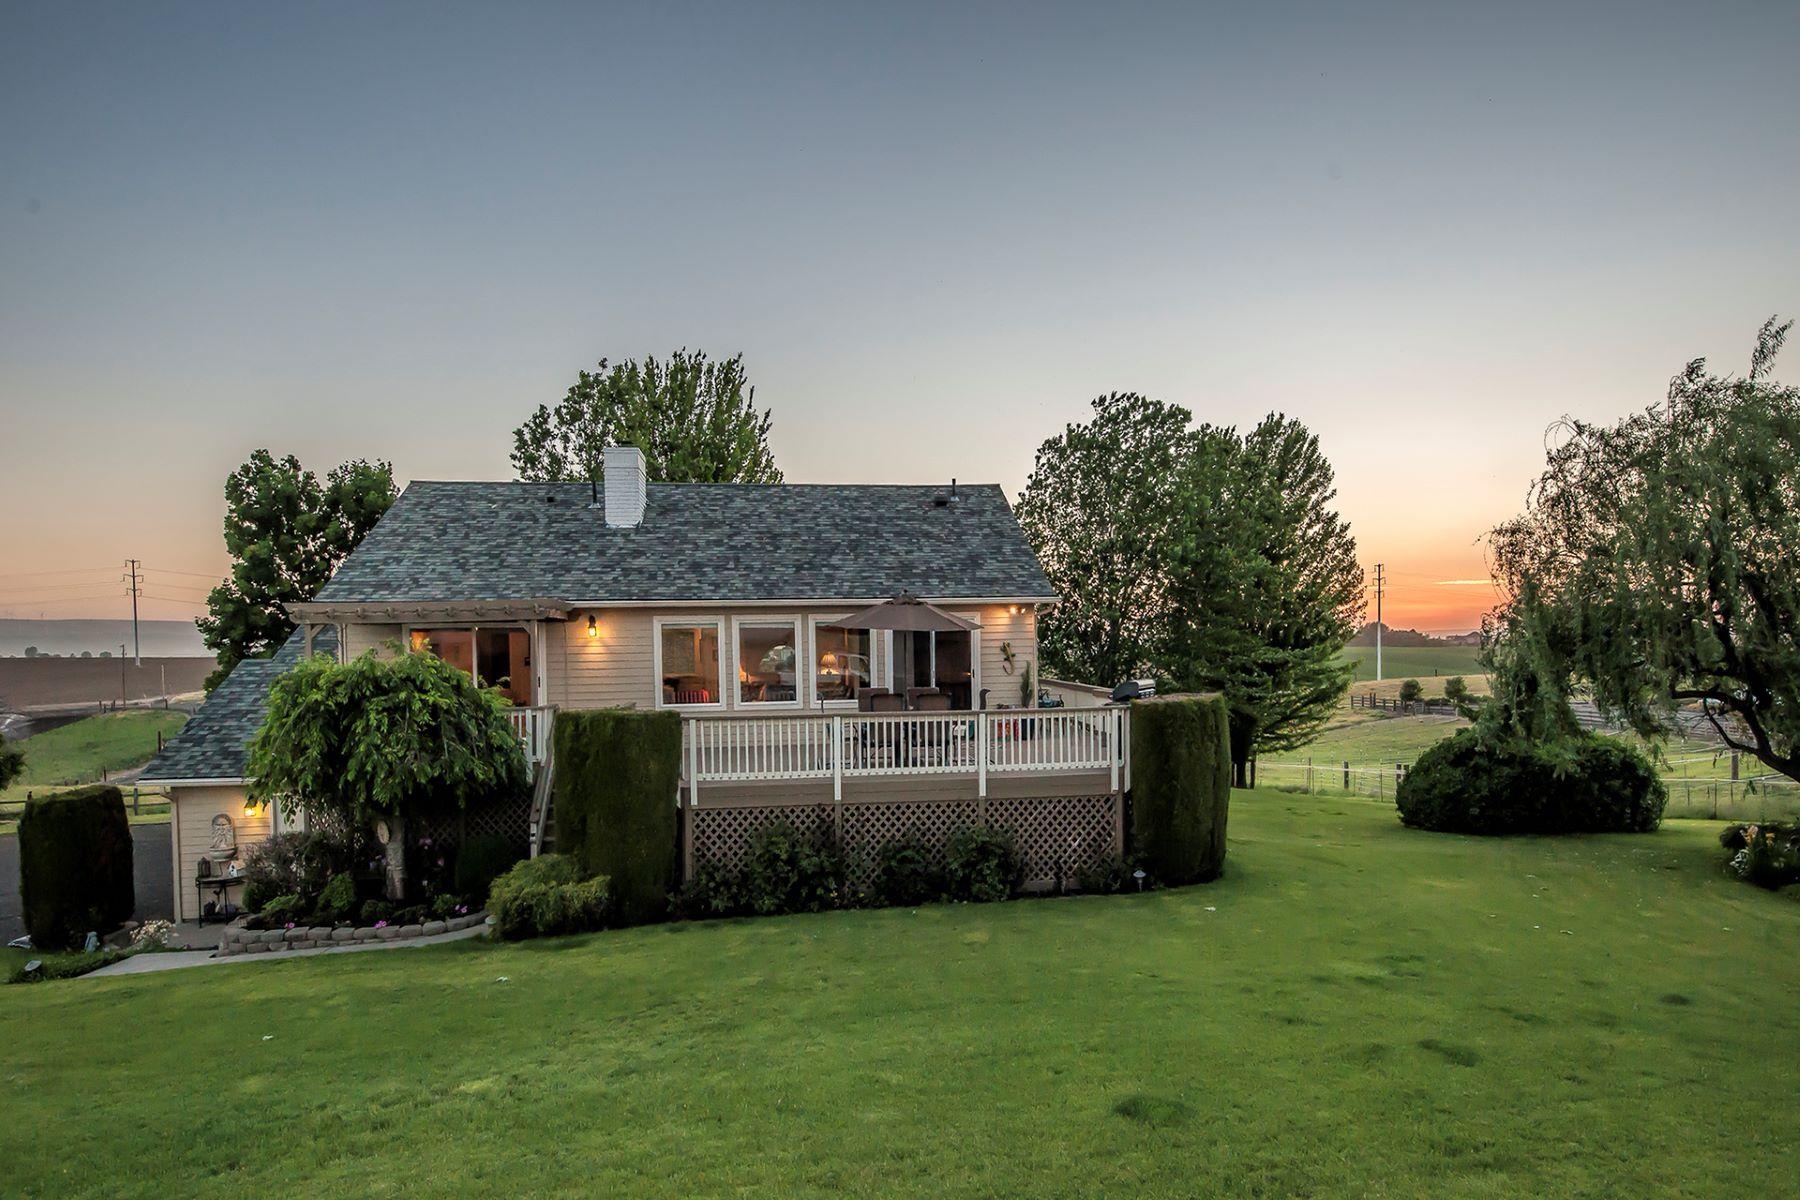 Single Family Homes for Sale at 288 Meadowlark Lane Touchet, Washington 99360 United States